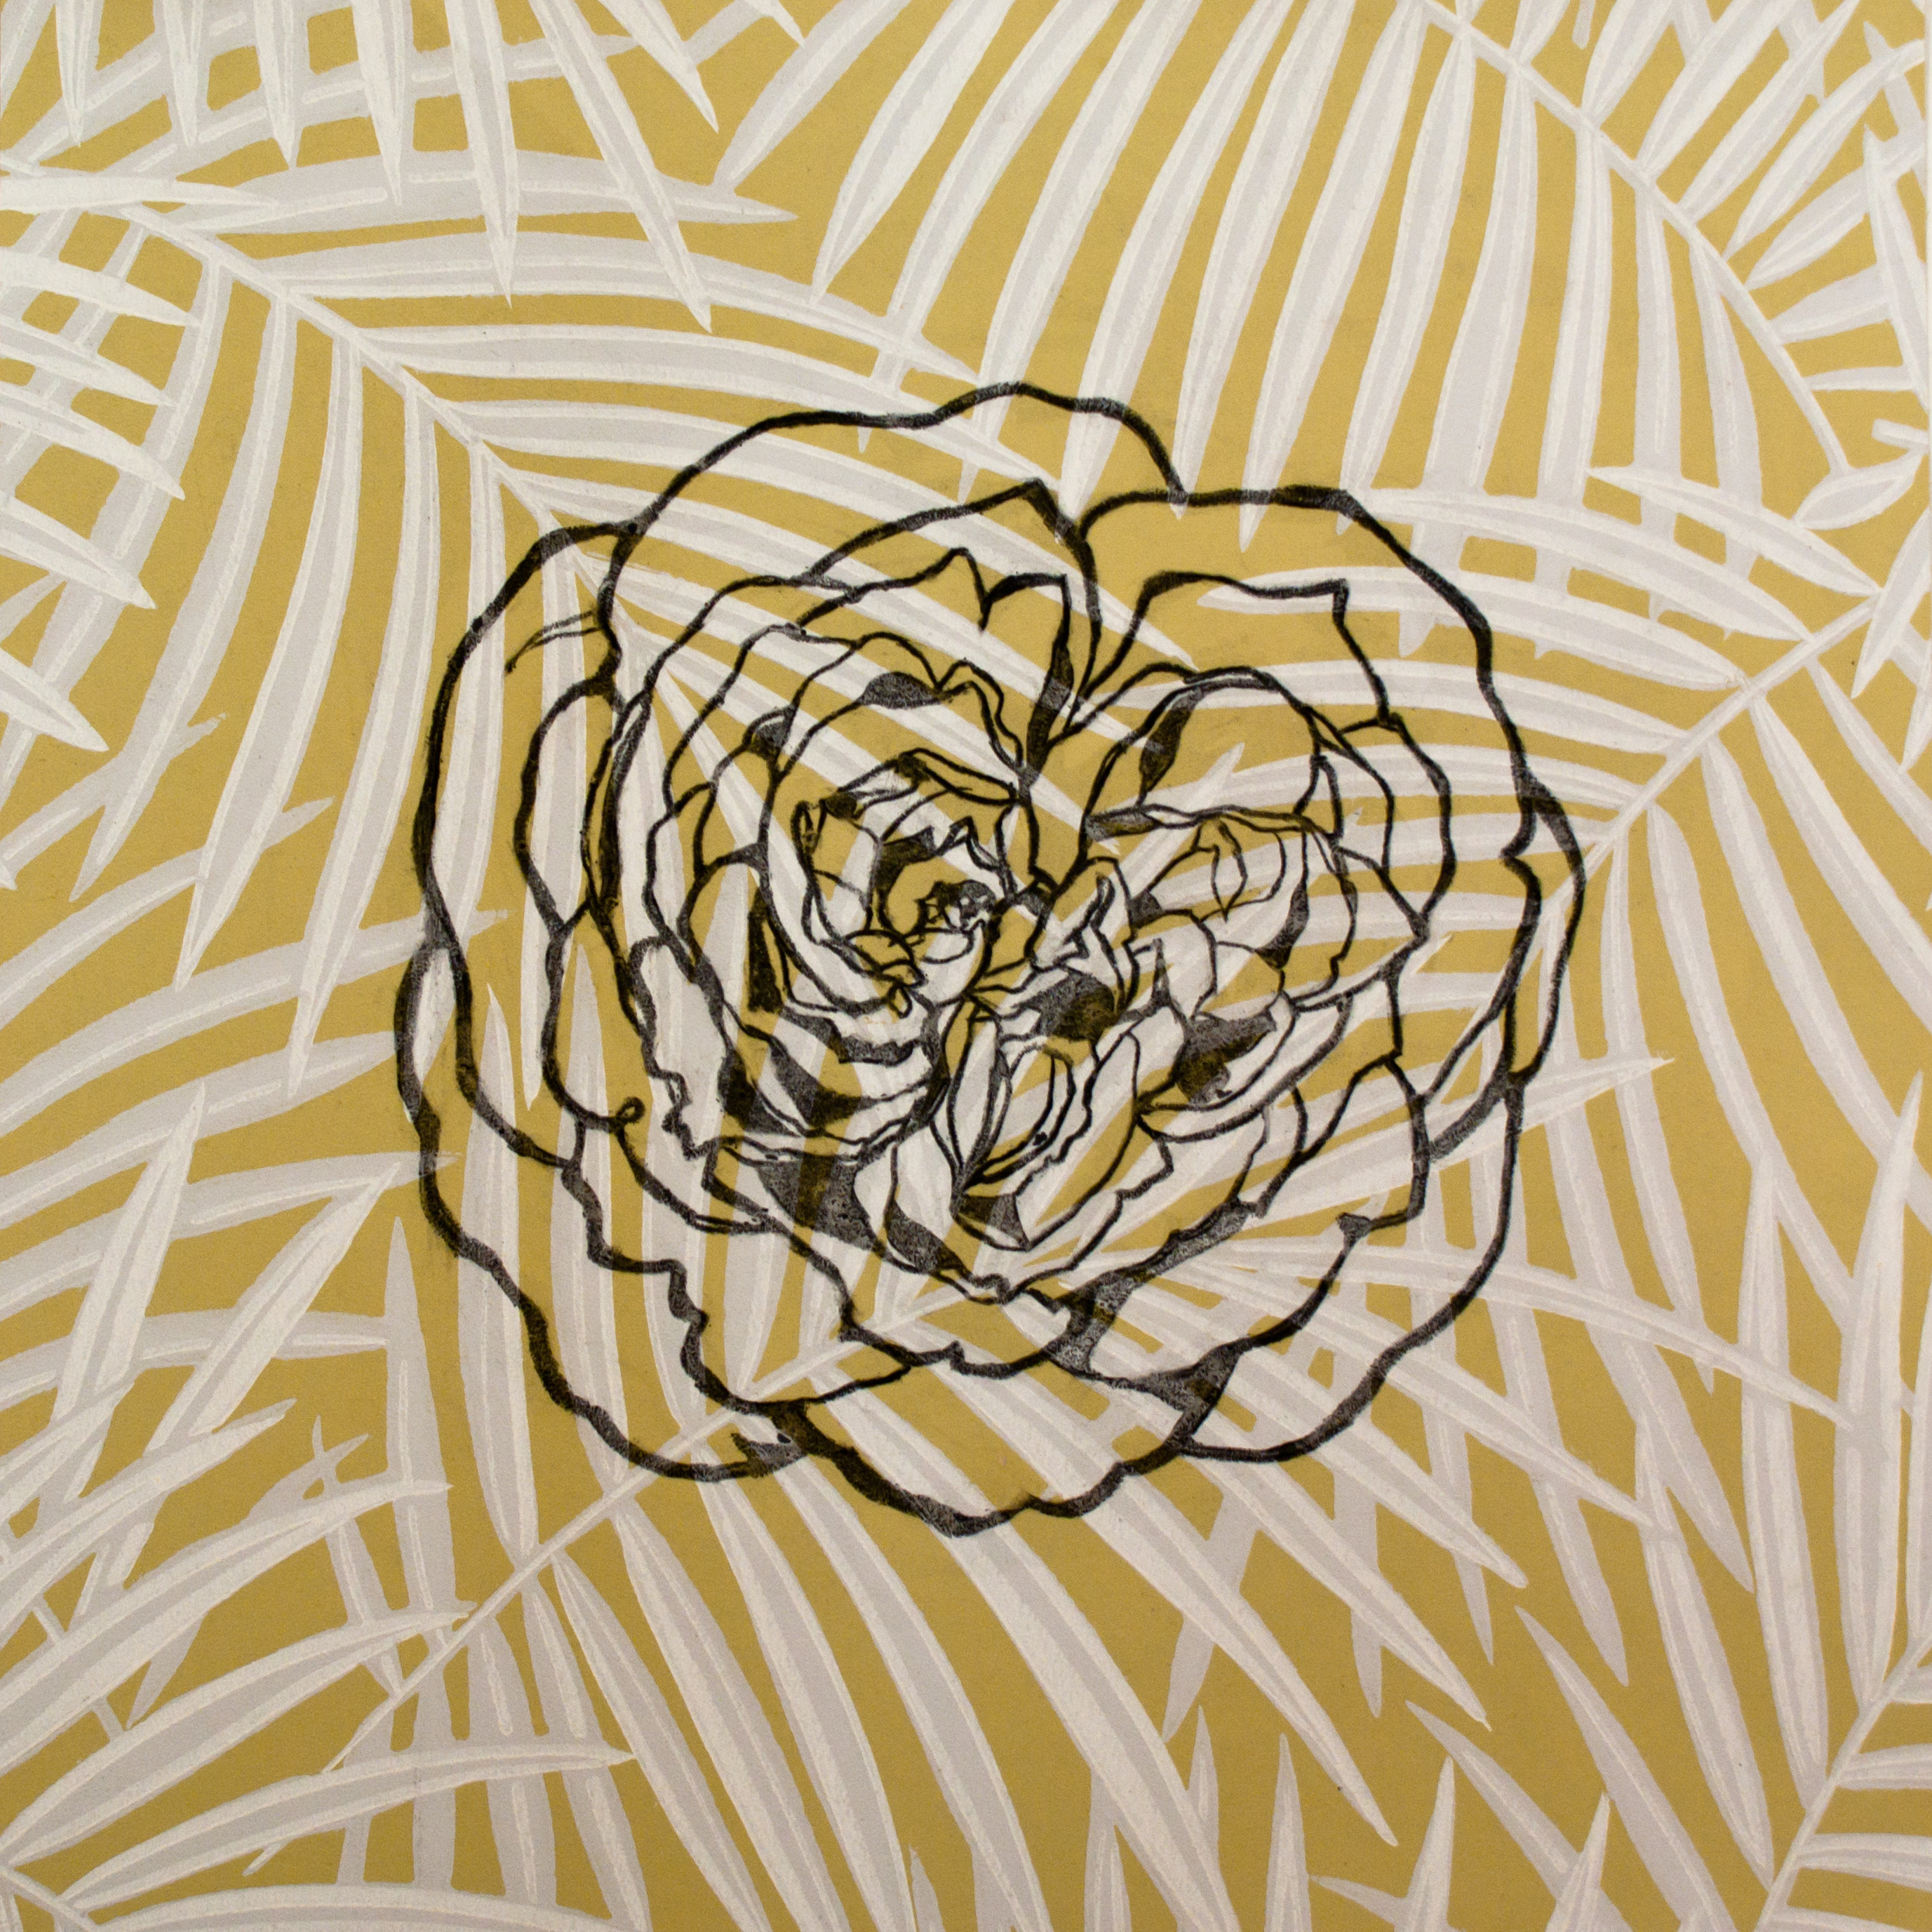 42 english rose perdita 15x15 charcoal on wallpaper sample 2013 jaap o5pjmy